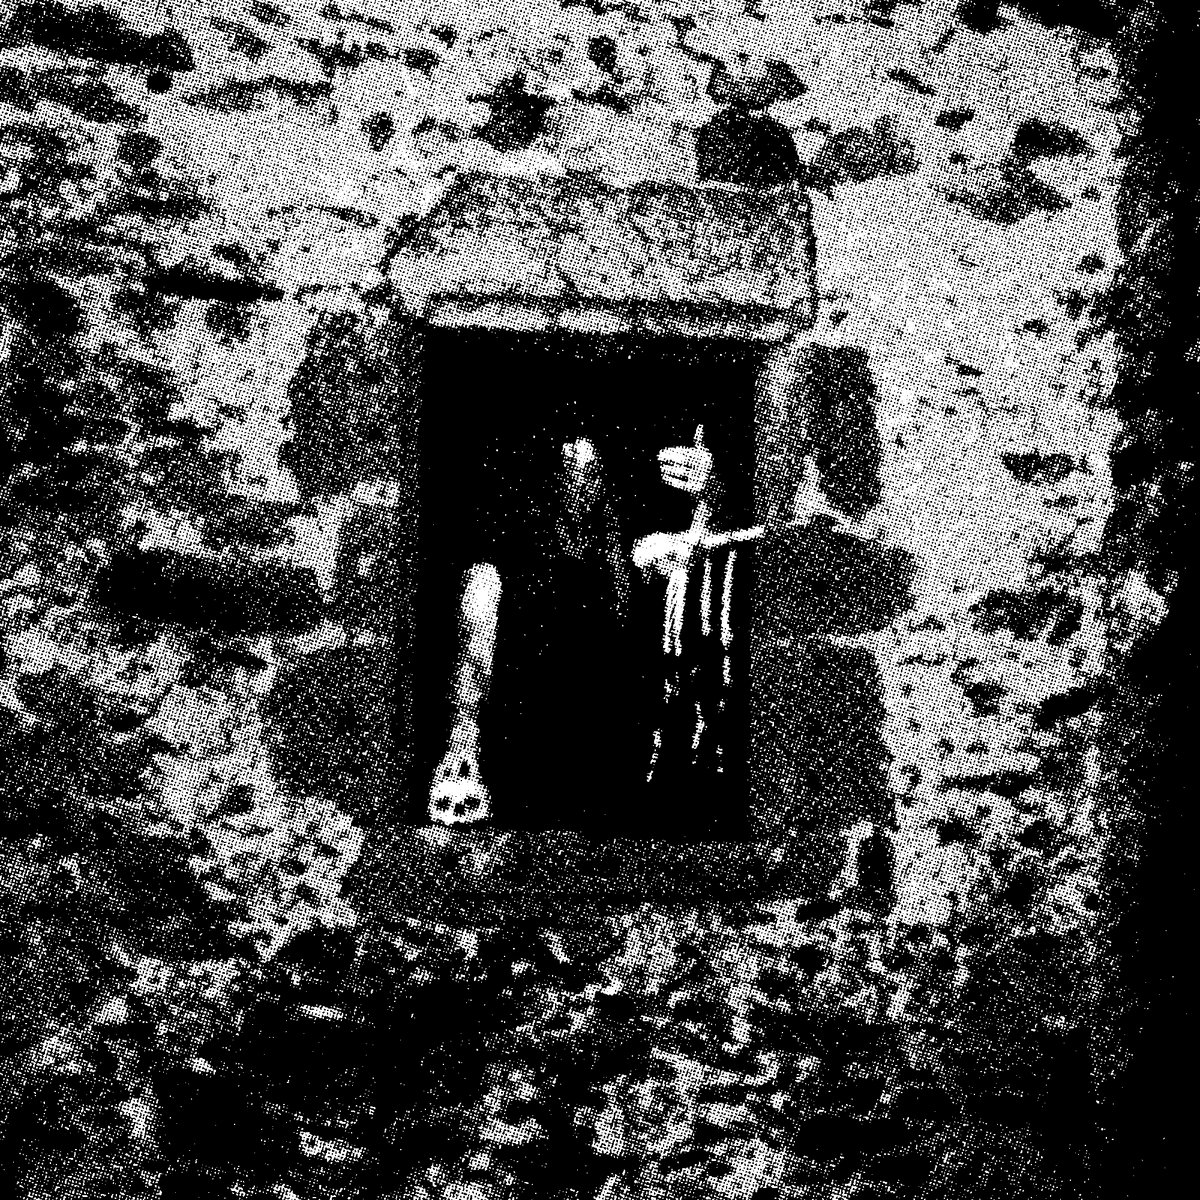 Sühnopfer black metal